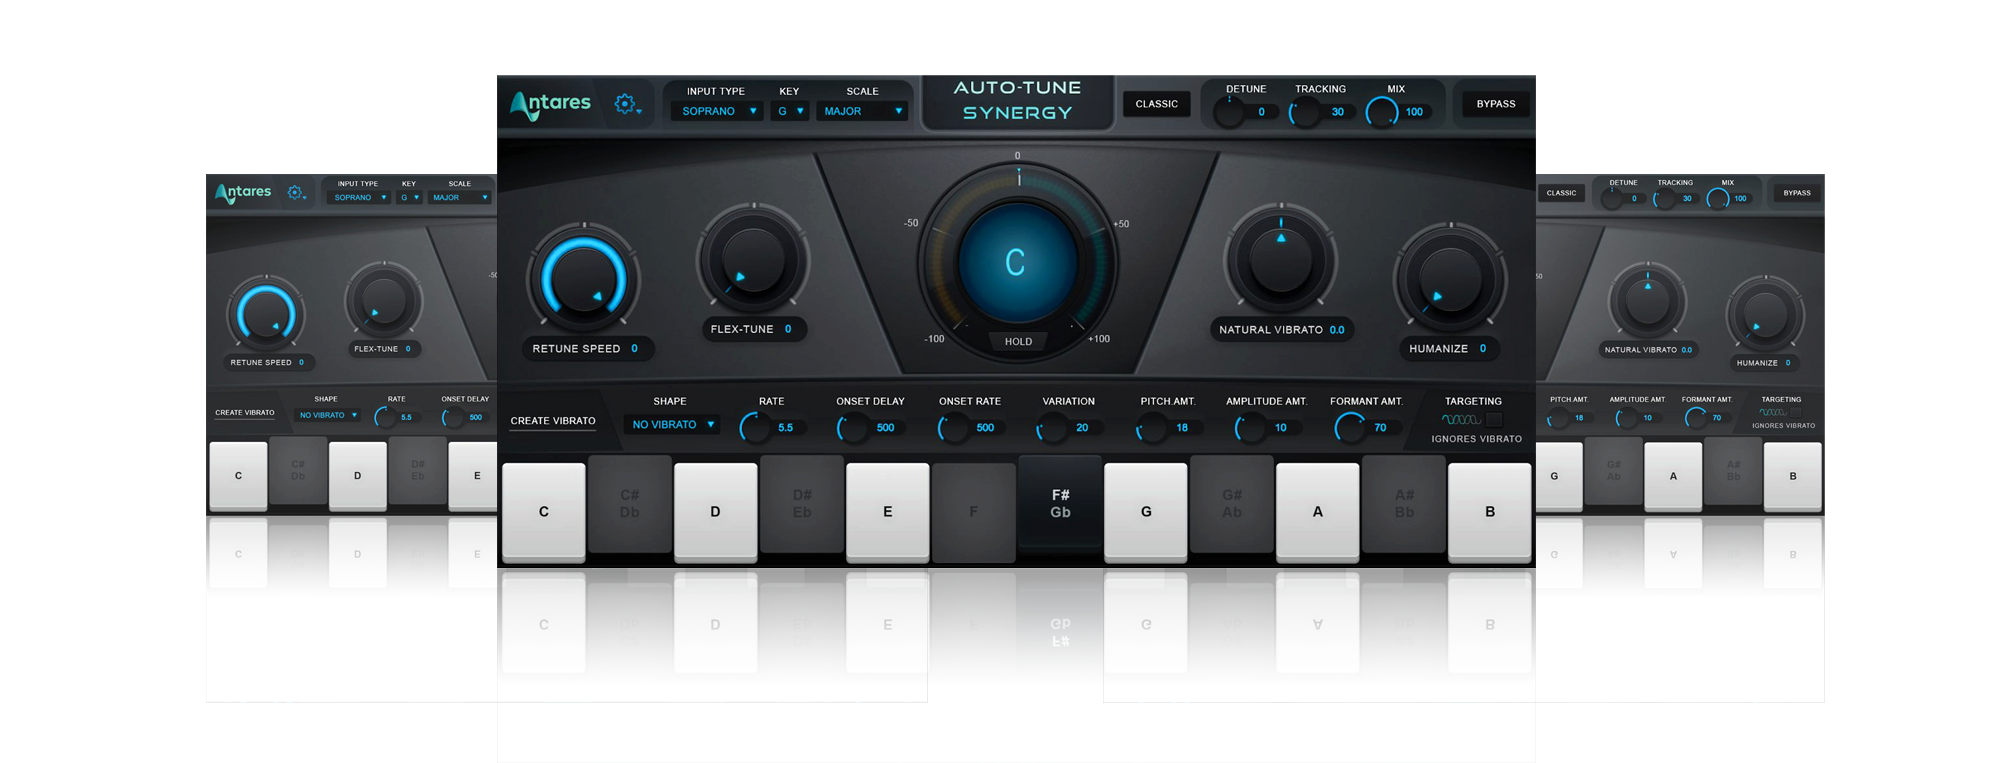 Auto Tune Synergy interface  1